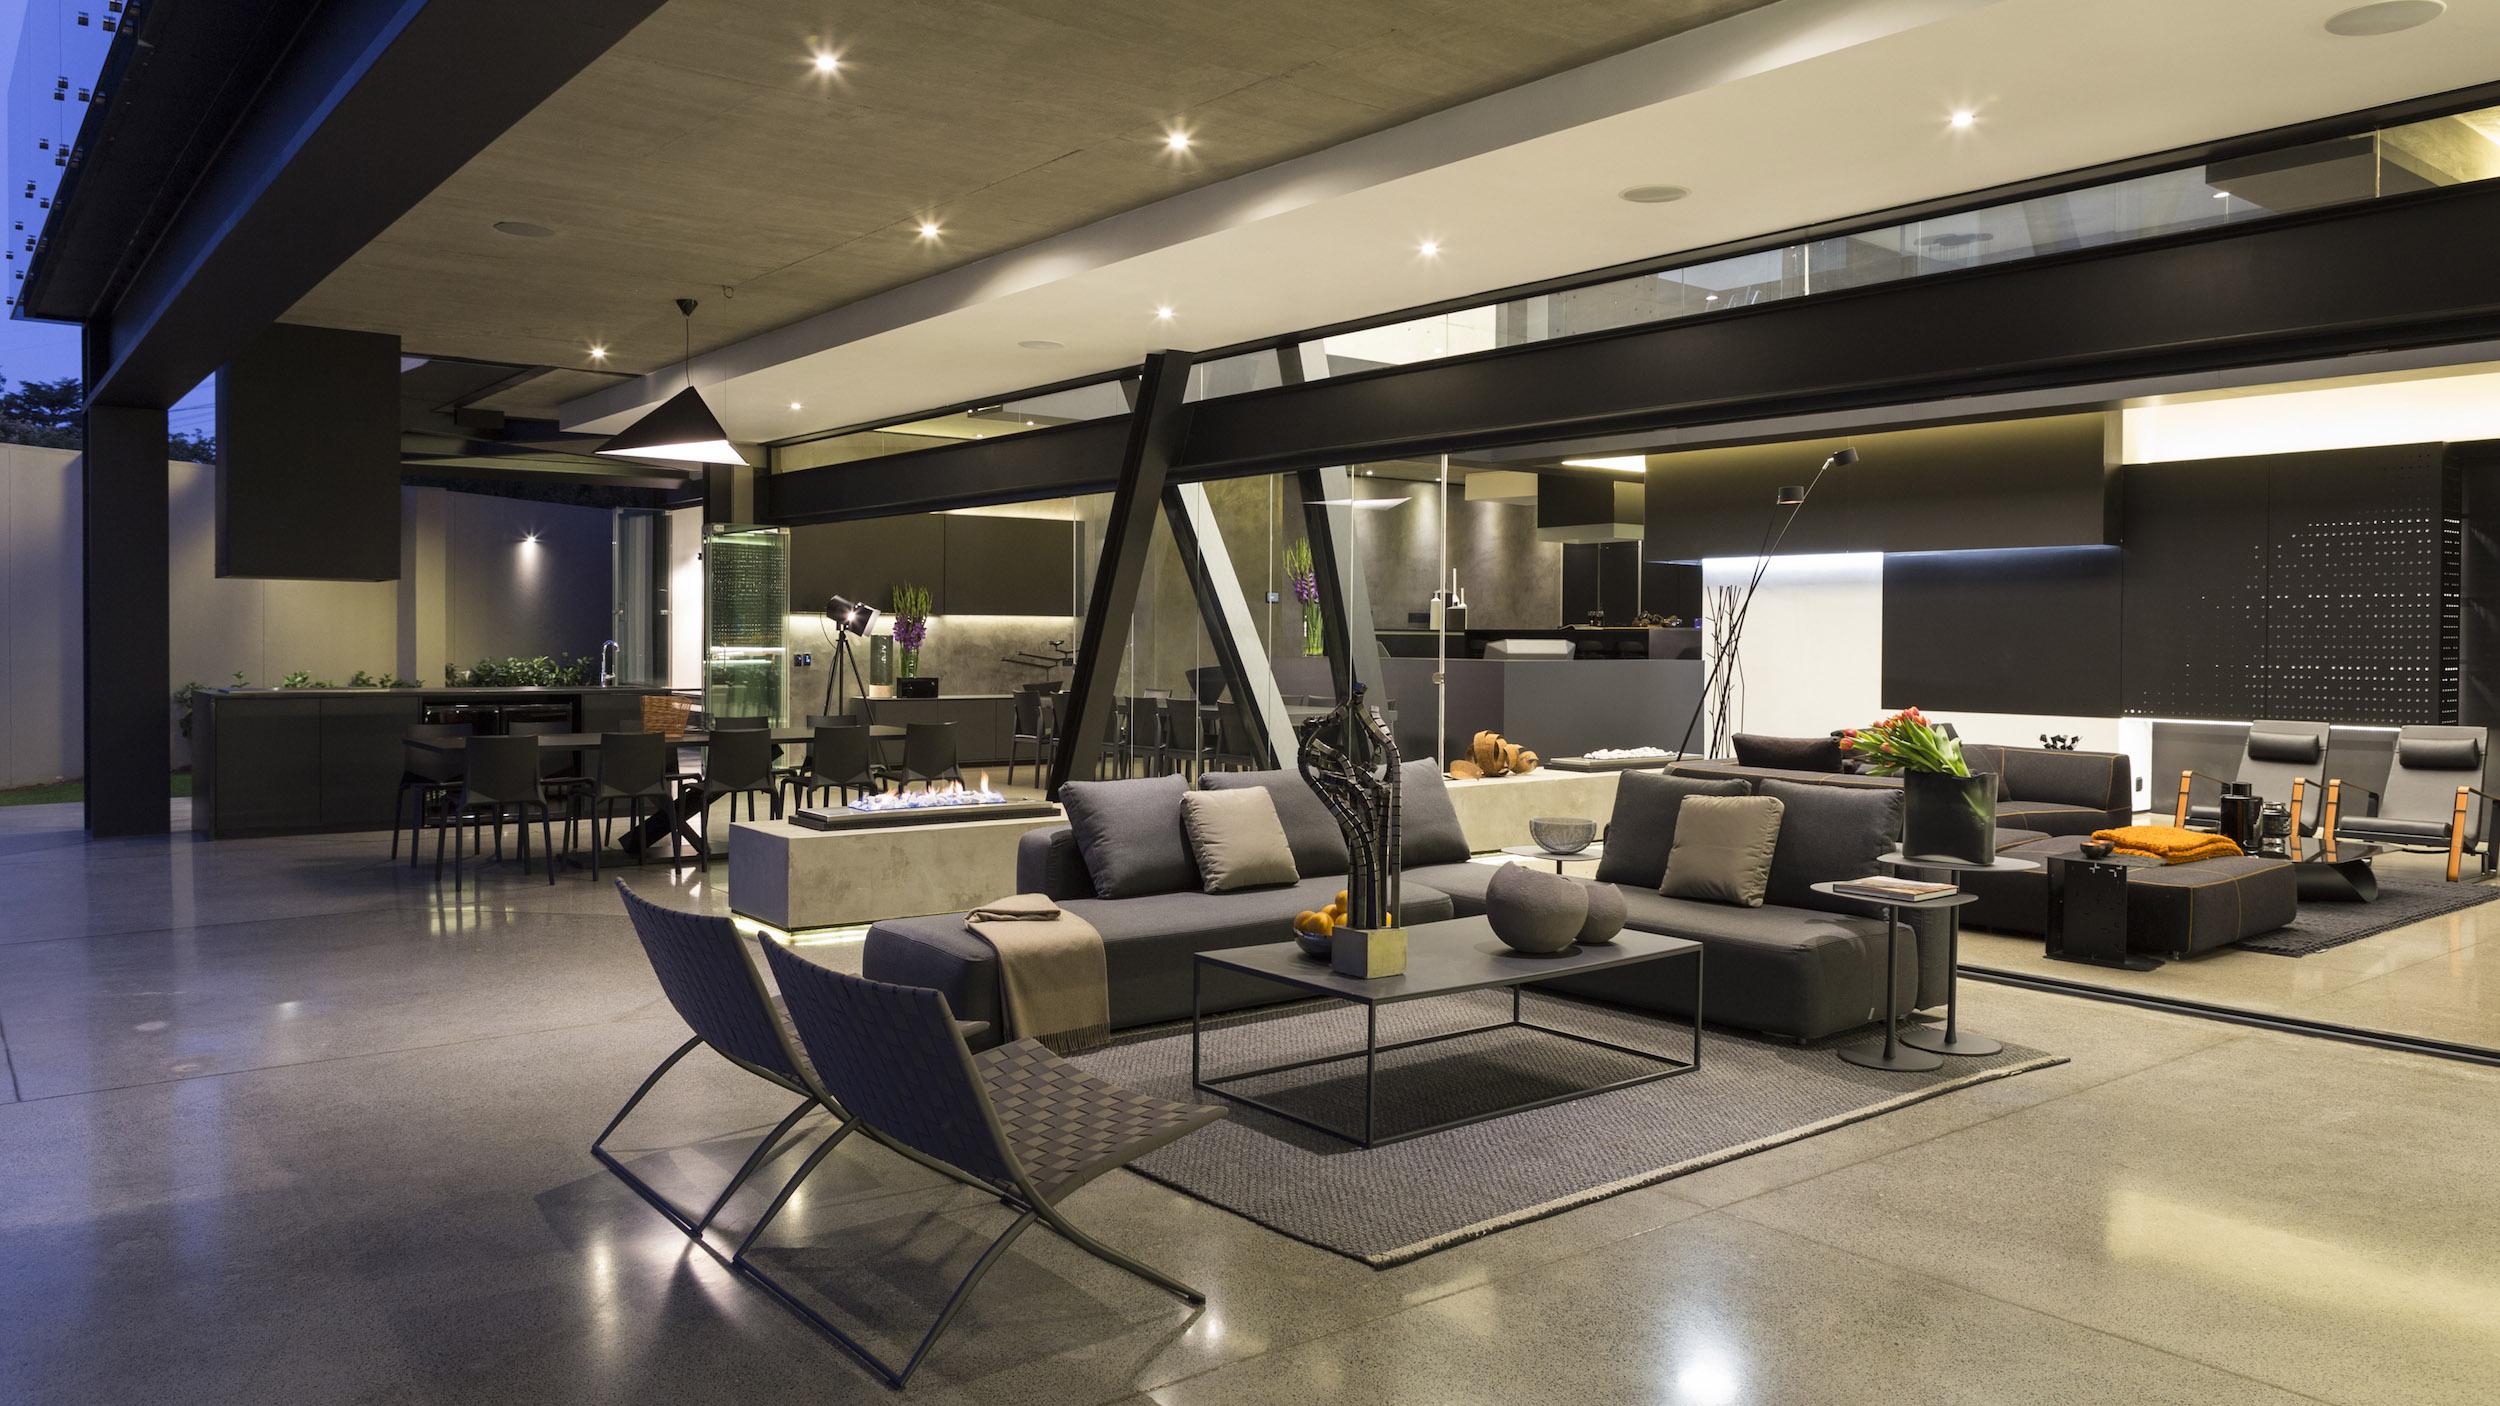 Kloof Road Masterpiece House in Johannesburg by Nico van der Meulen Architects-26